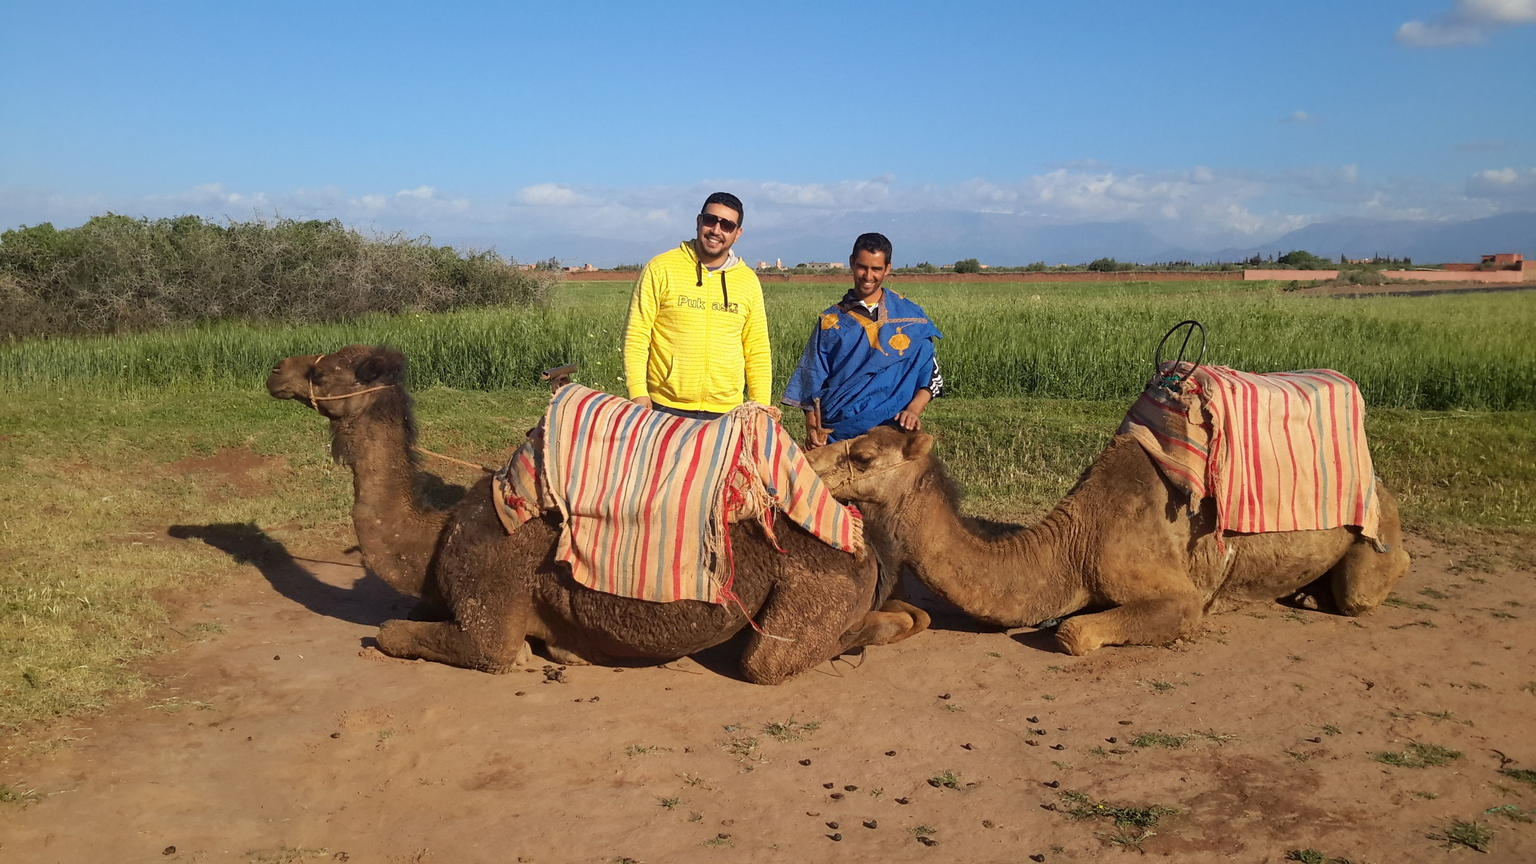 MORE PHOTOS, Atlas Mountains Day Trip with Camel Ride from Marrakech